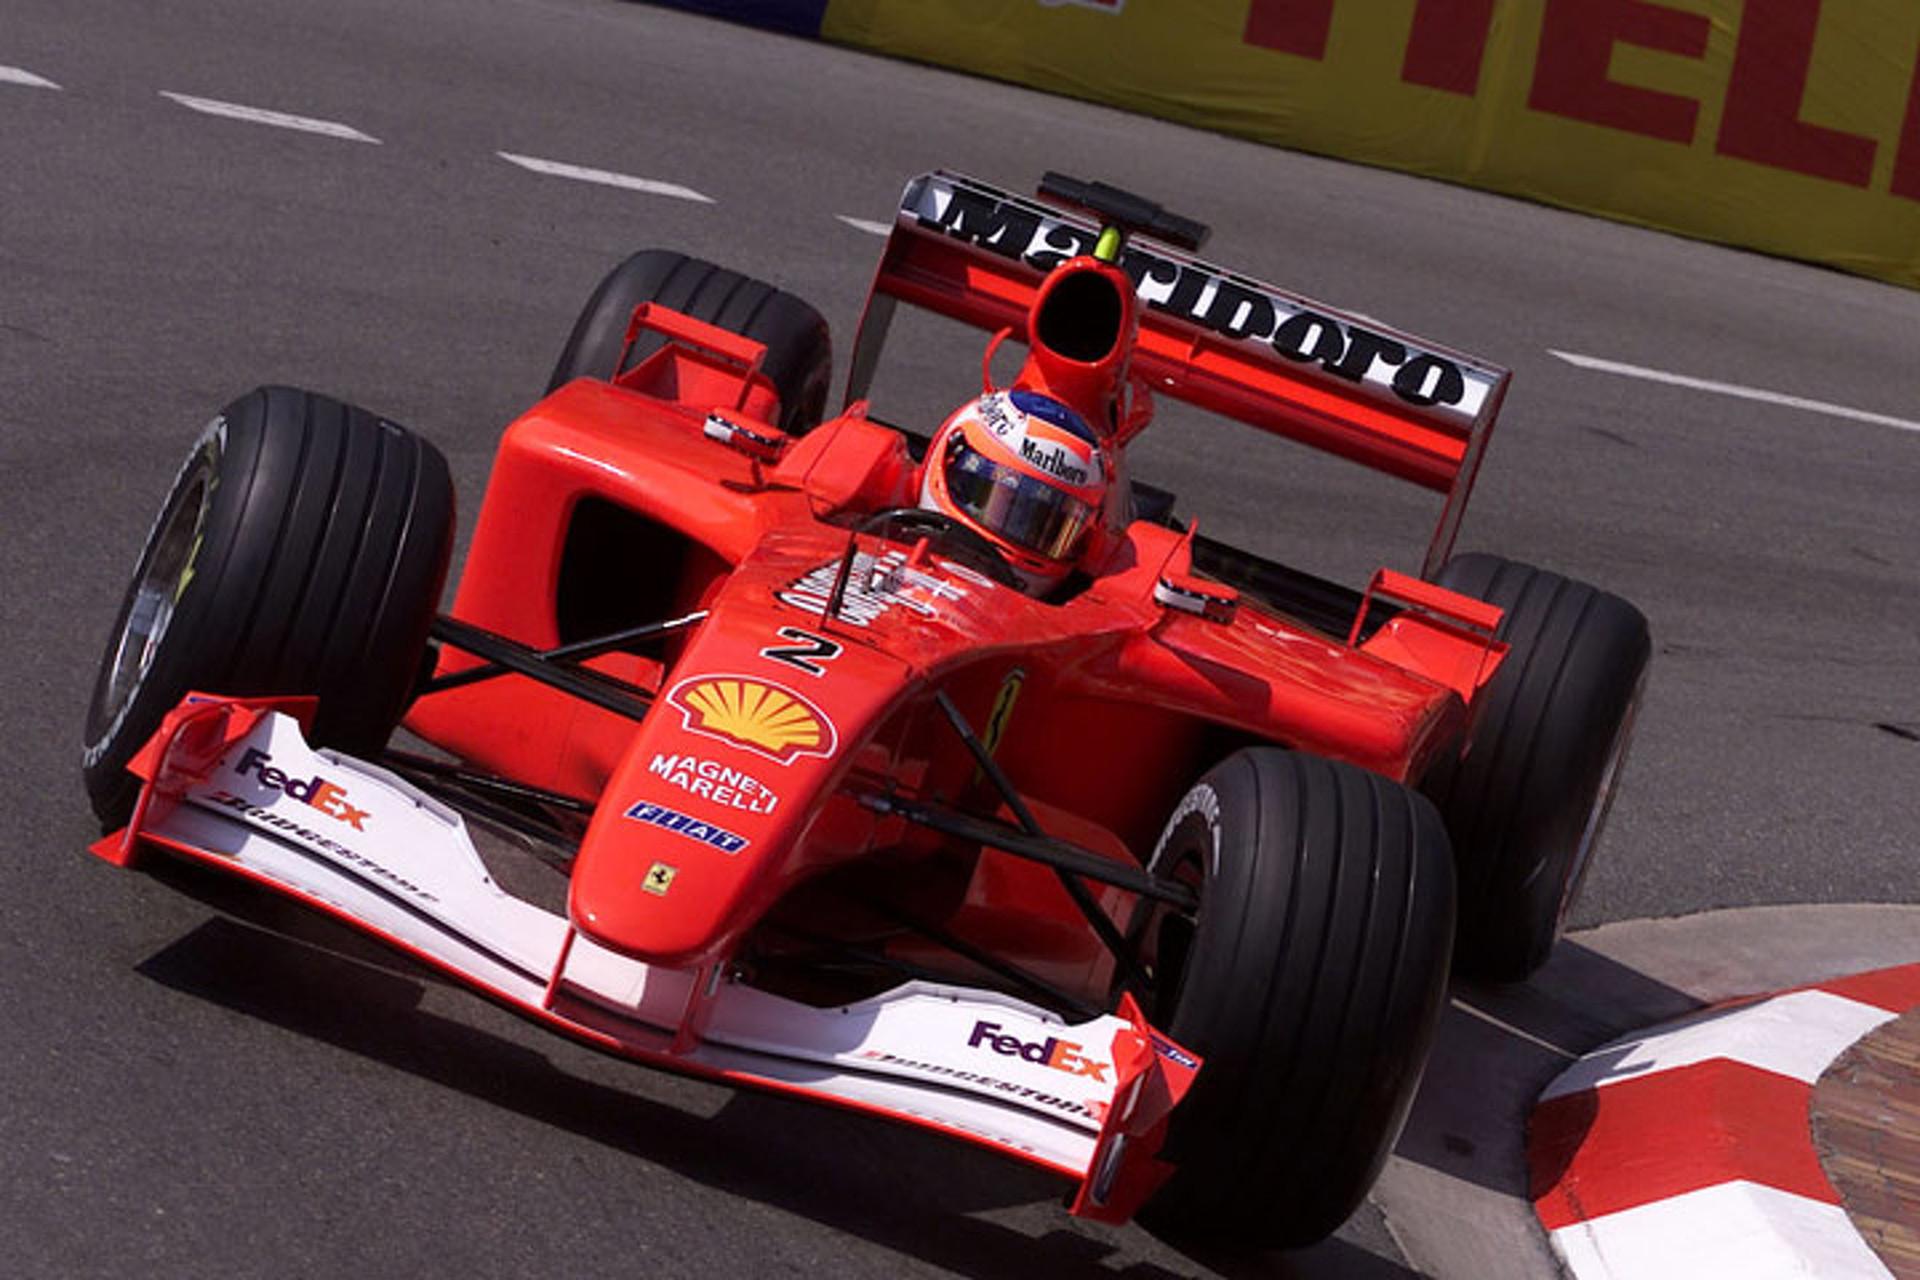 Up for Sale: Ferrari\'s 2001 Championship-Winning F1 Car